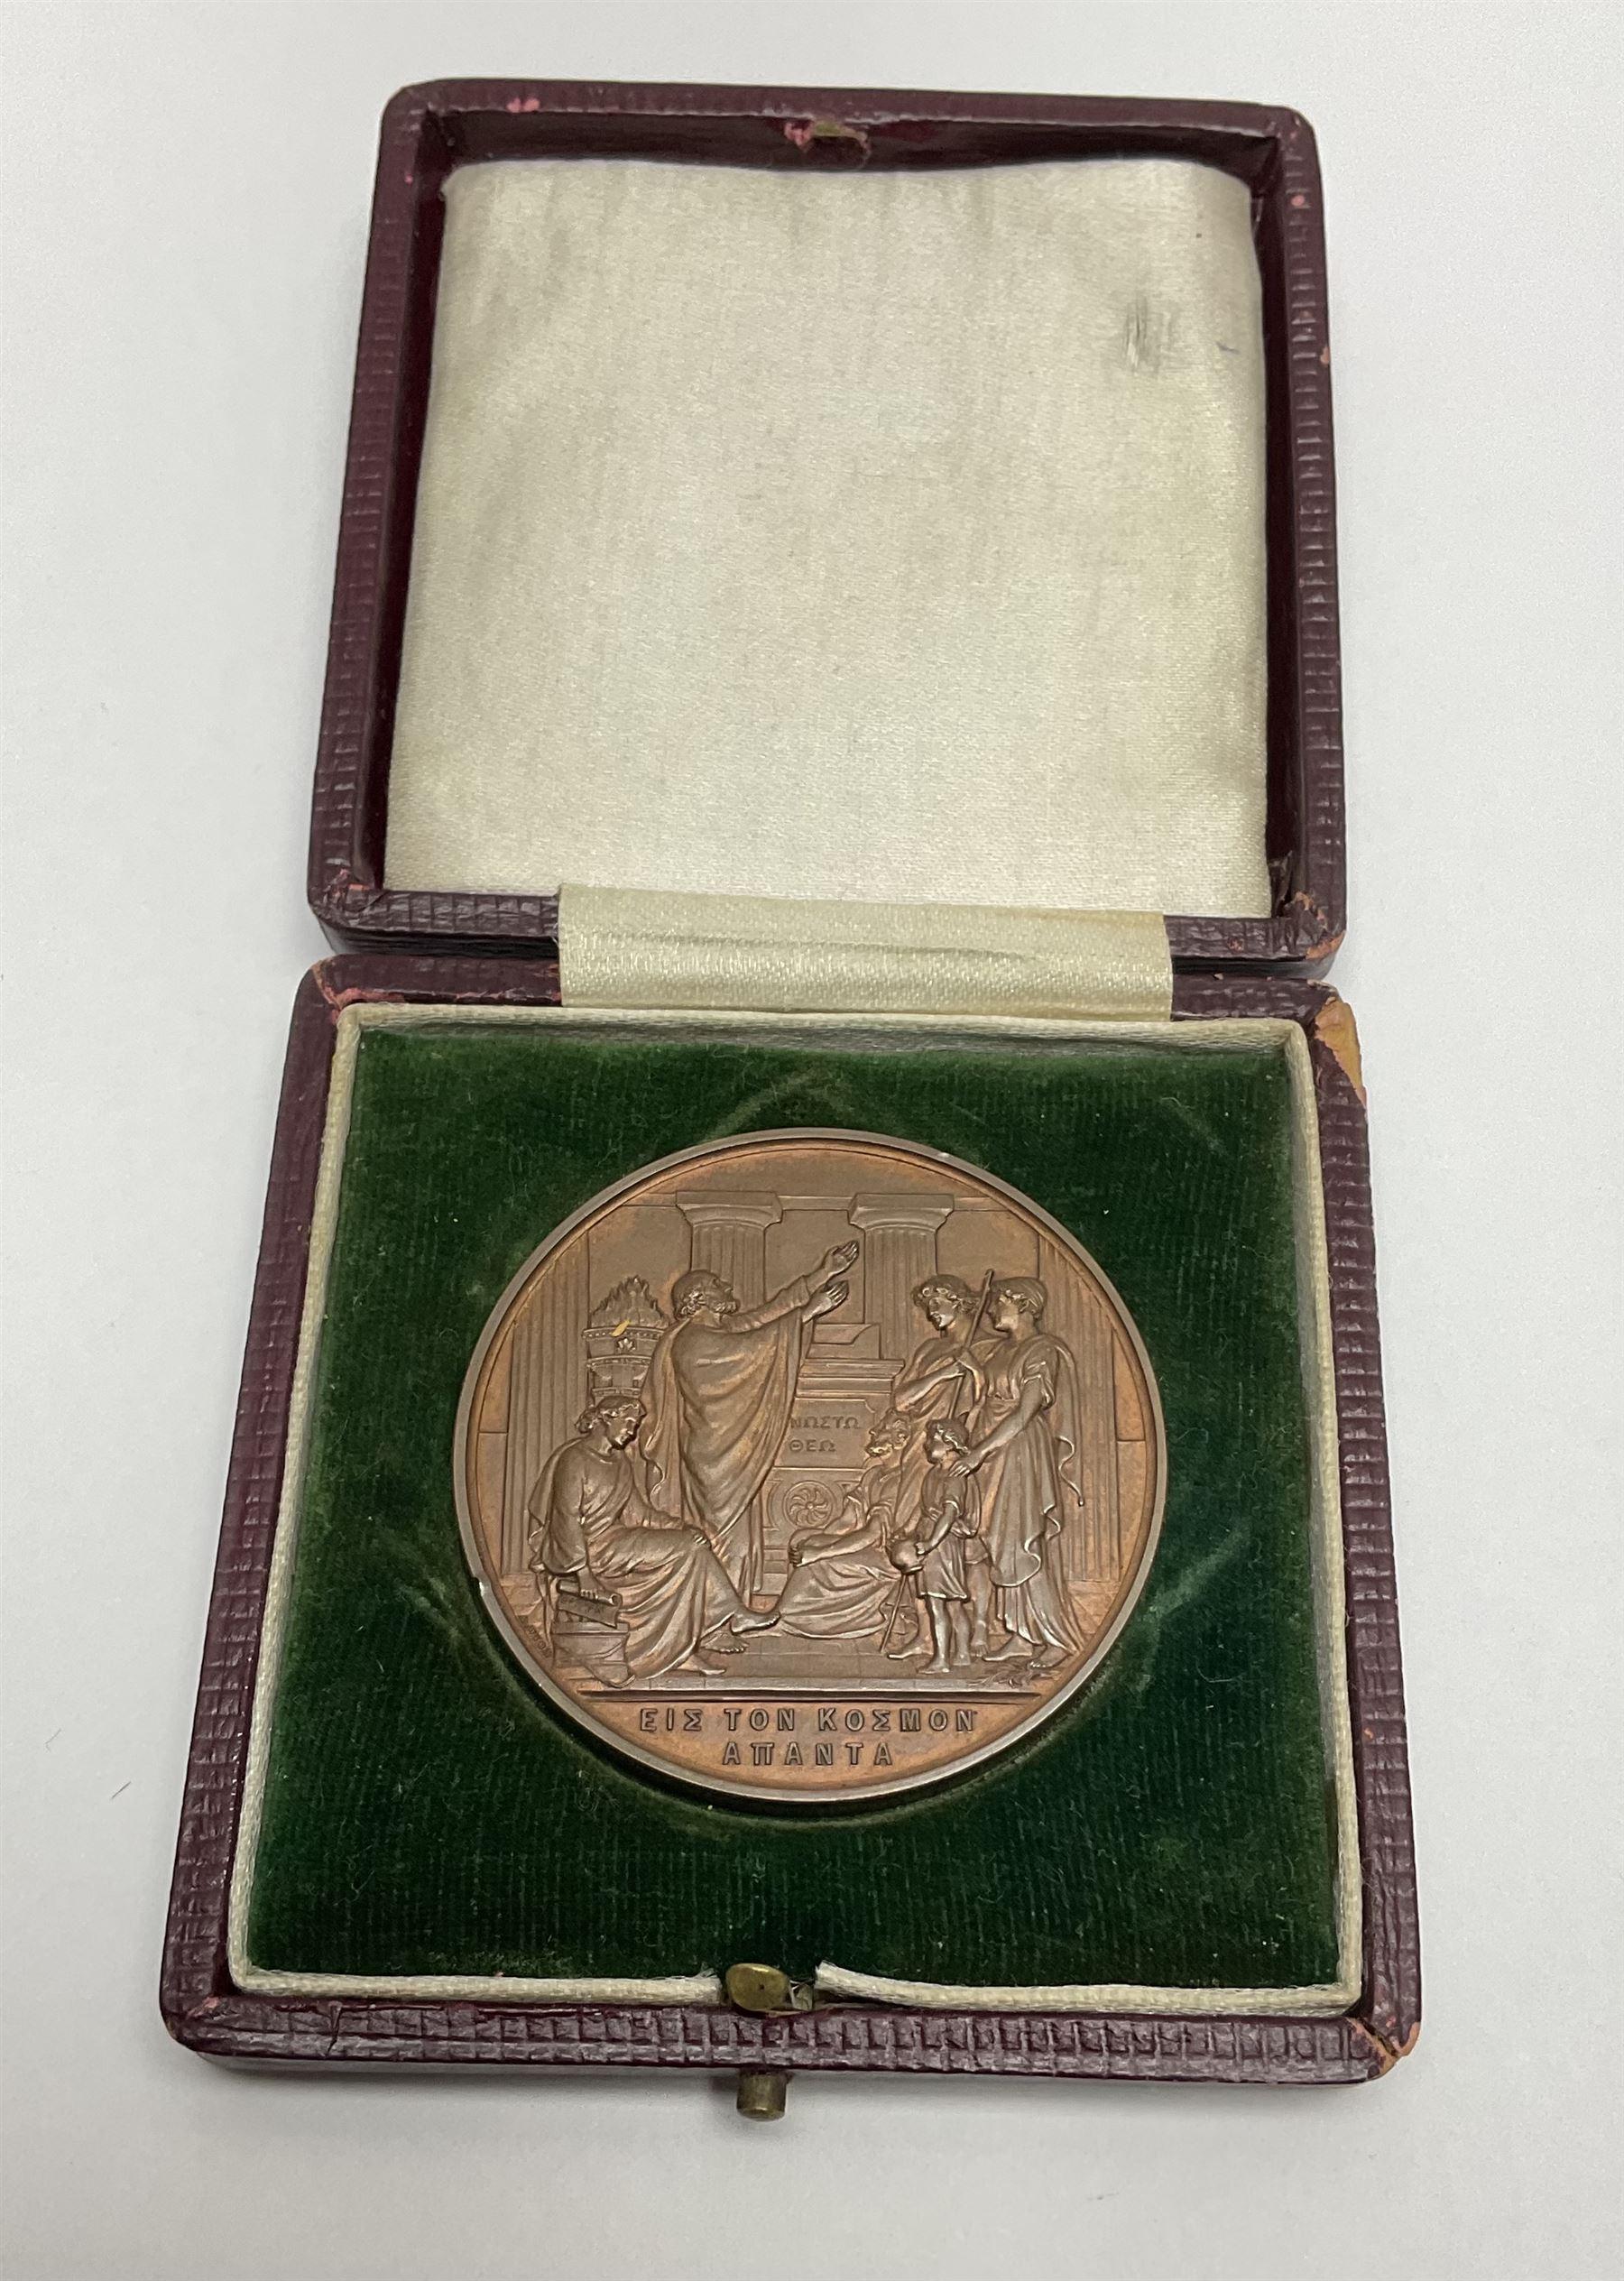 David Livingstone (1813-1873) commemorative medallion celebrating the Centenary of his birth - Image 3 of 4